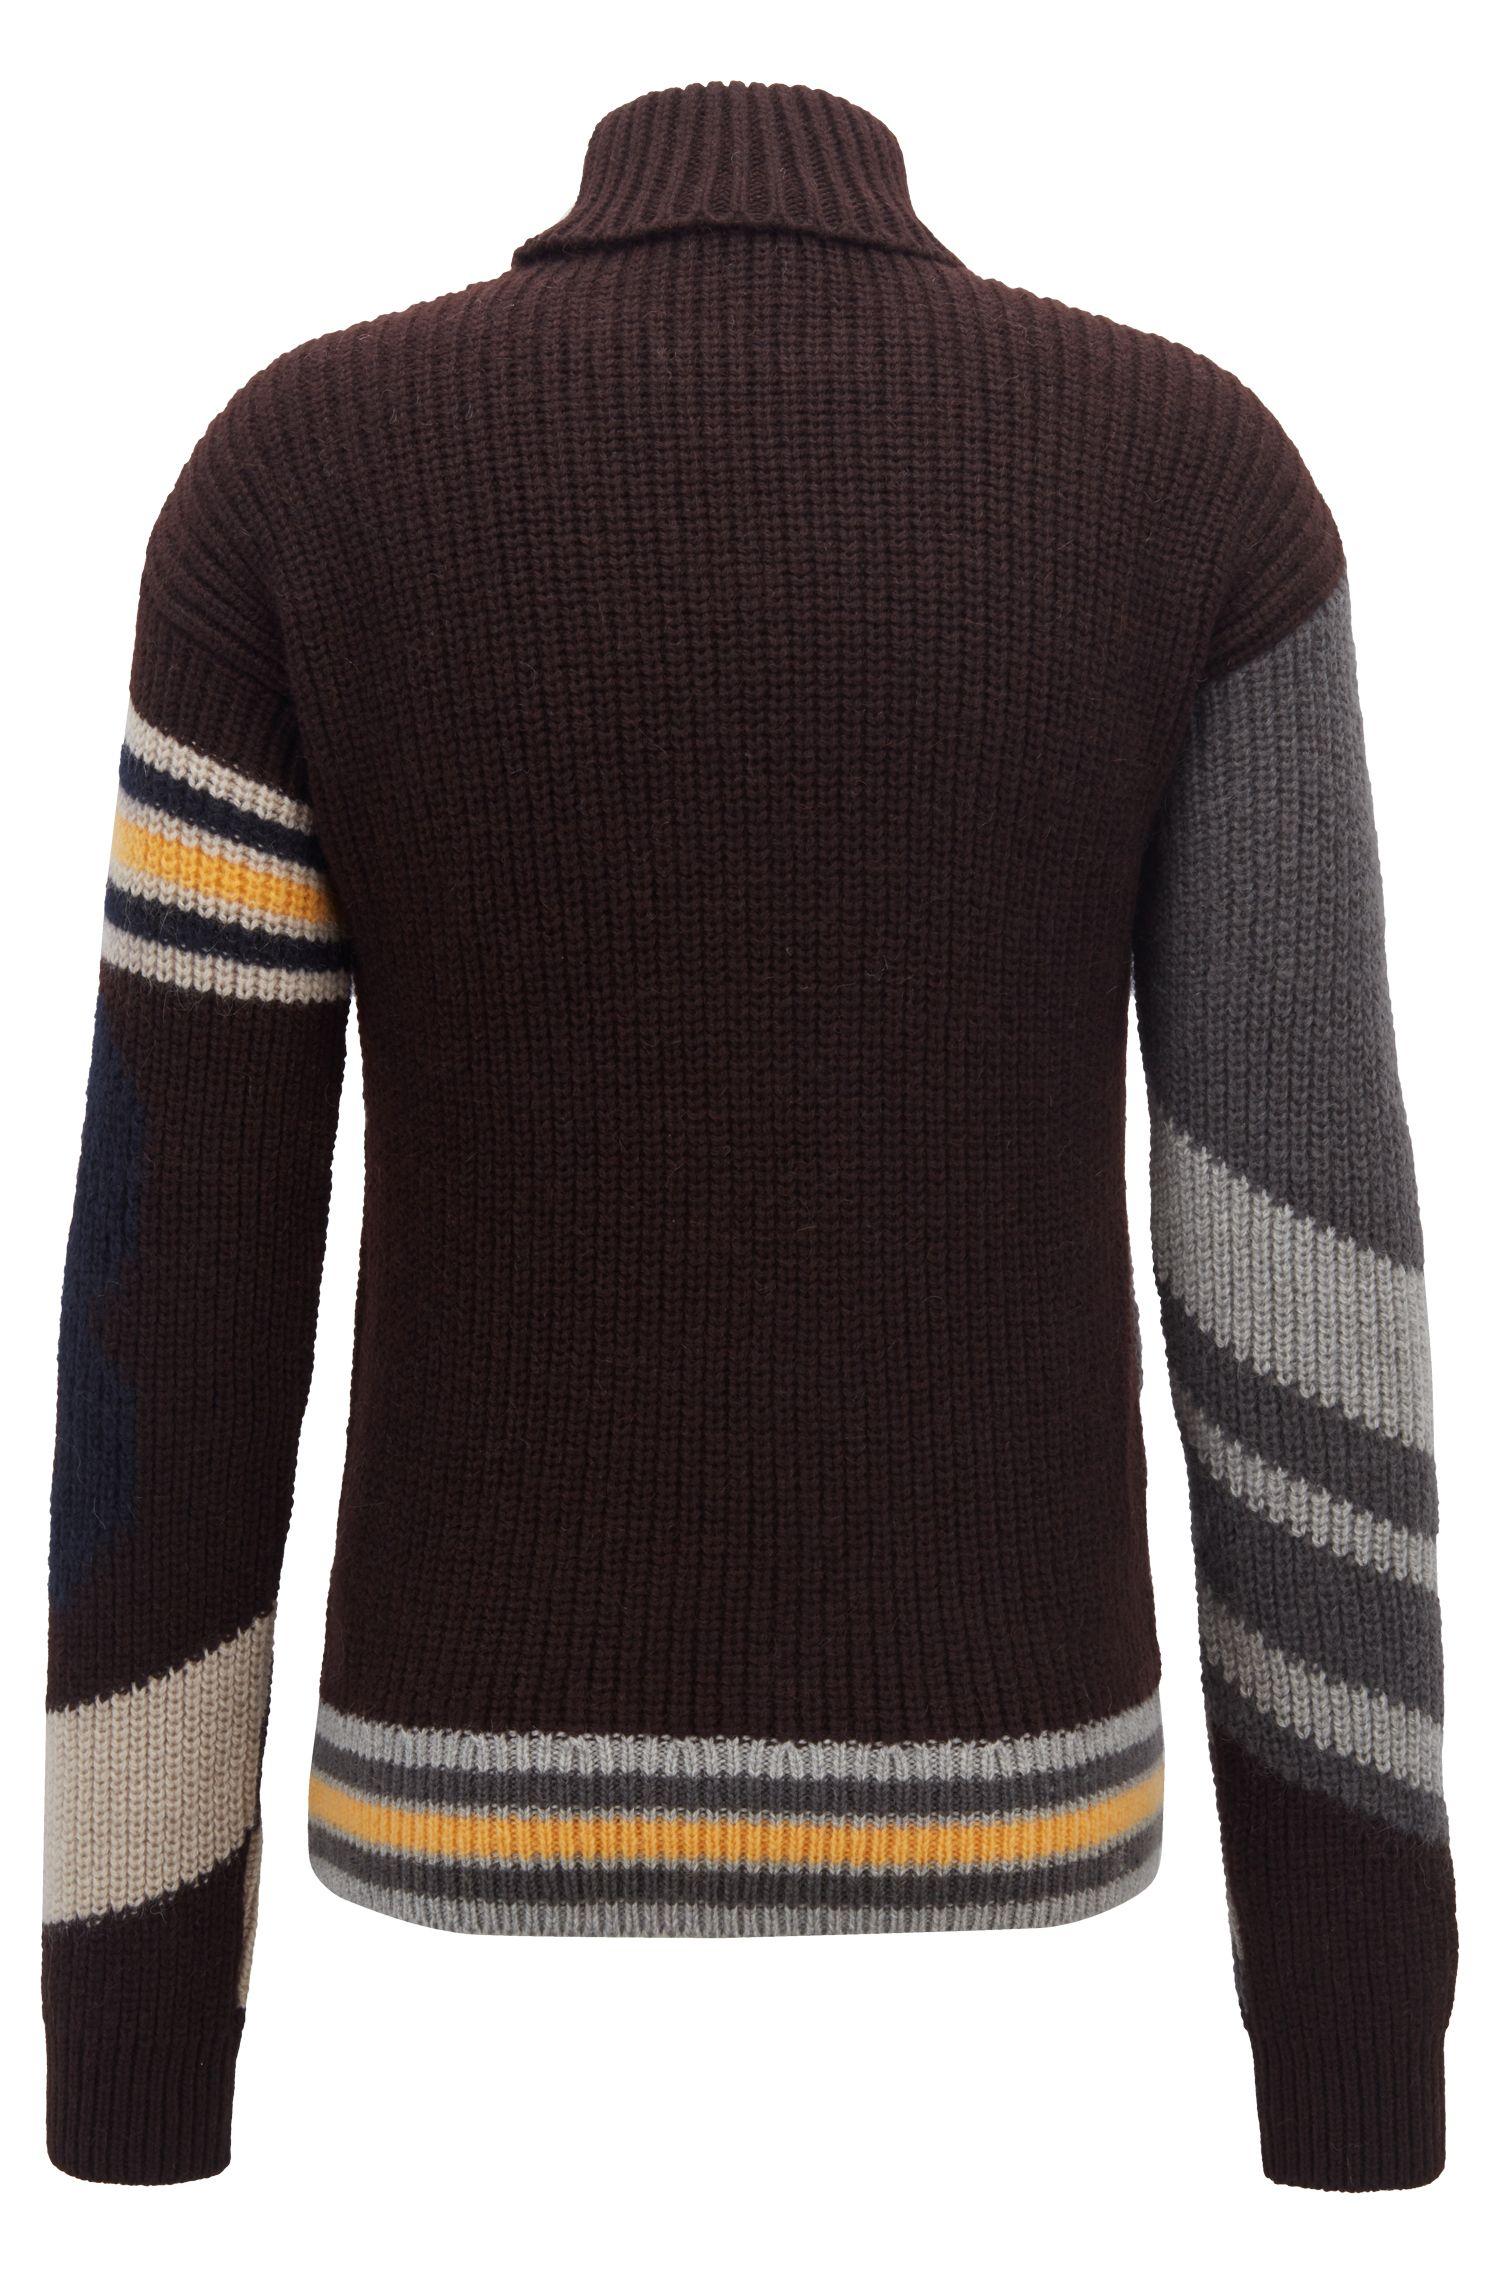 Fashion Show Capsule turtleneck sweater with baseball intarsia, Open Grey